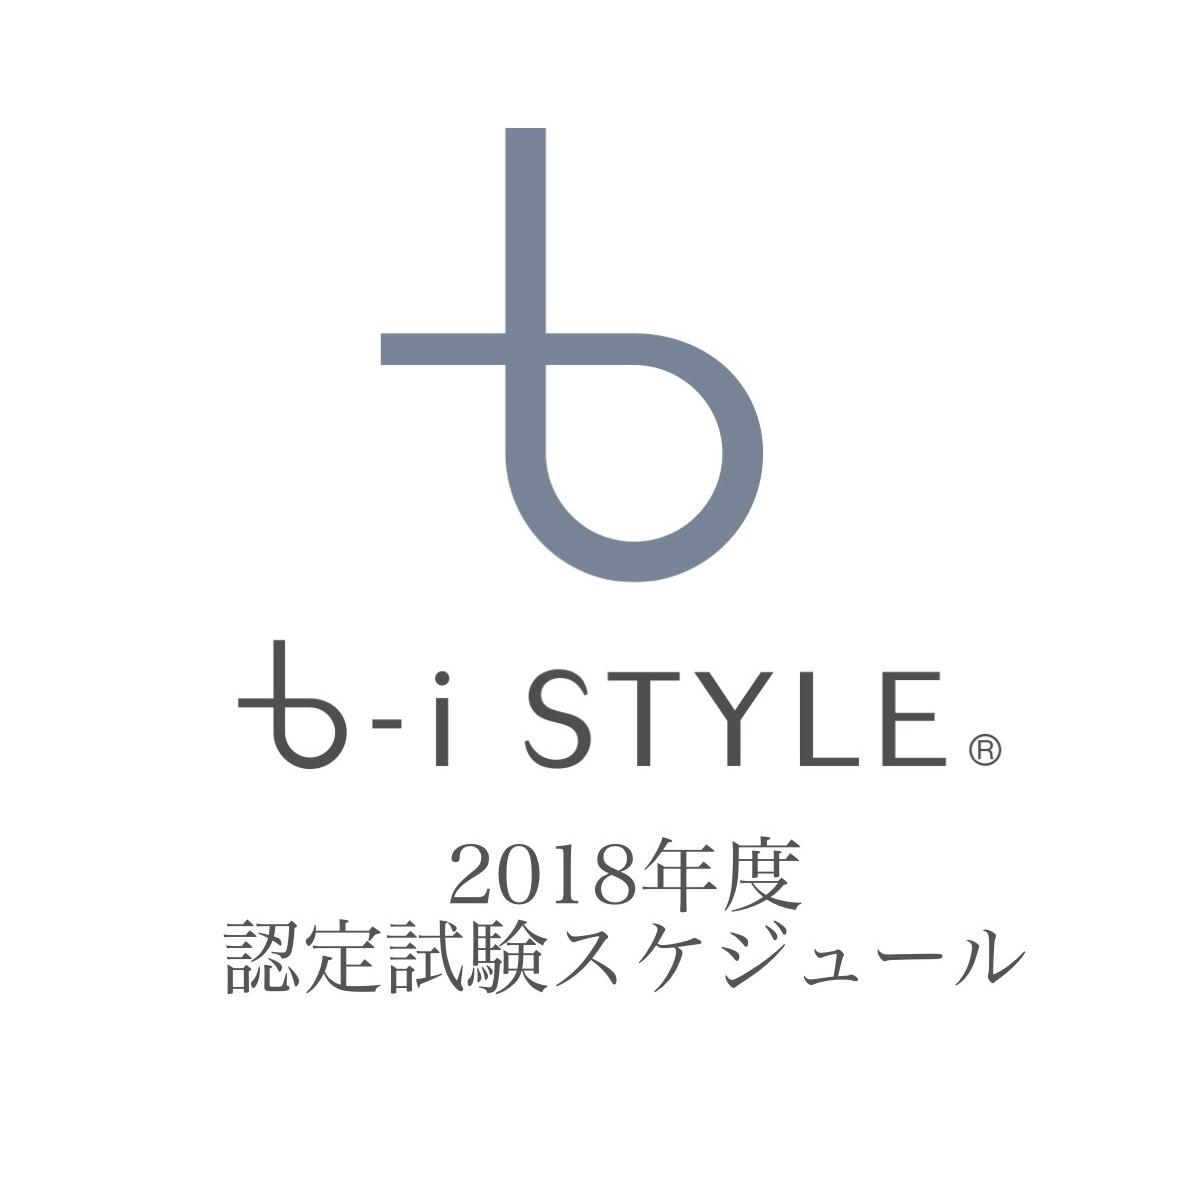 b-i style,ビースタイル,ビイスタイル,ビィスタイル